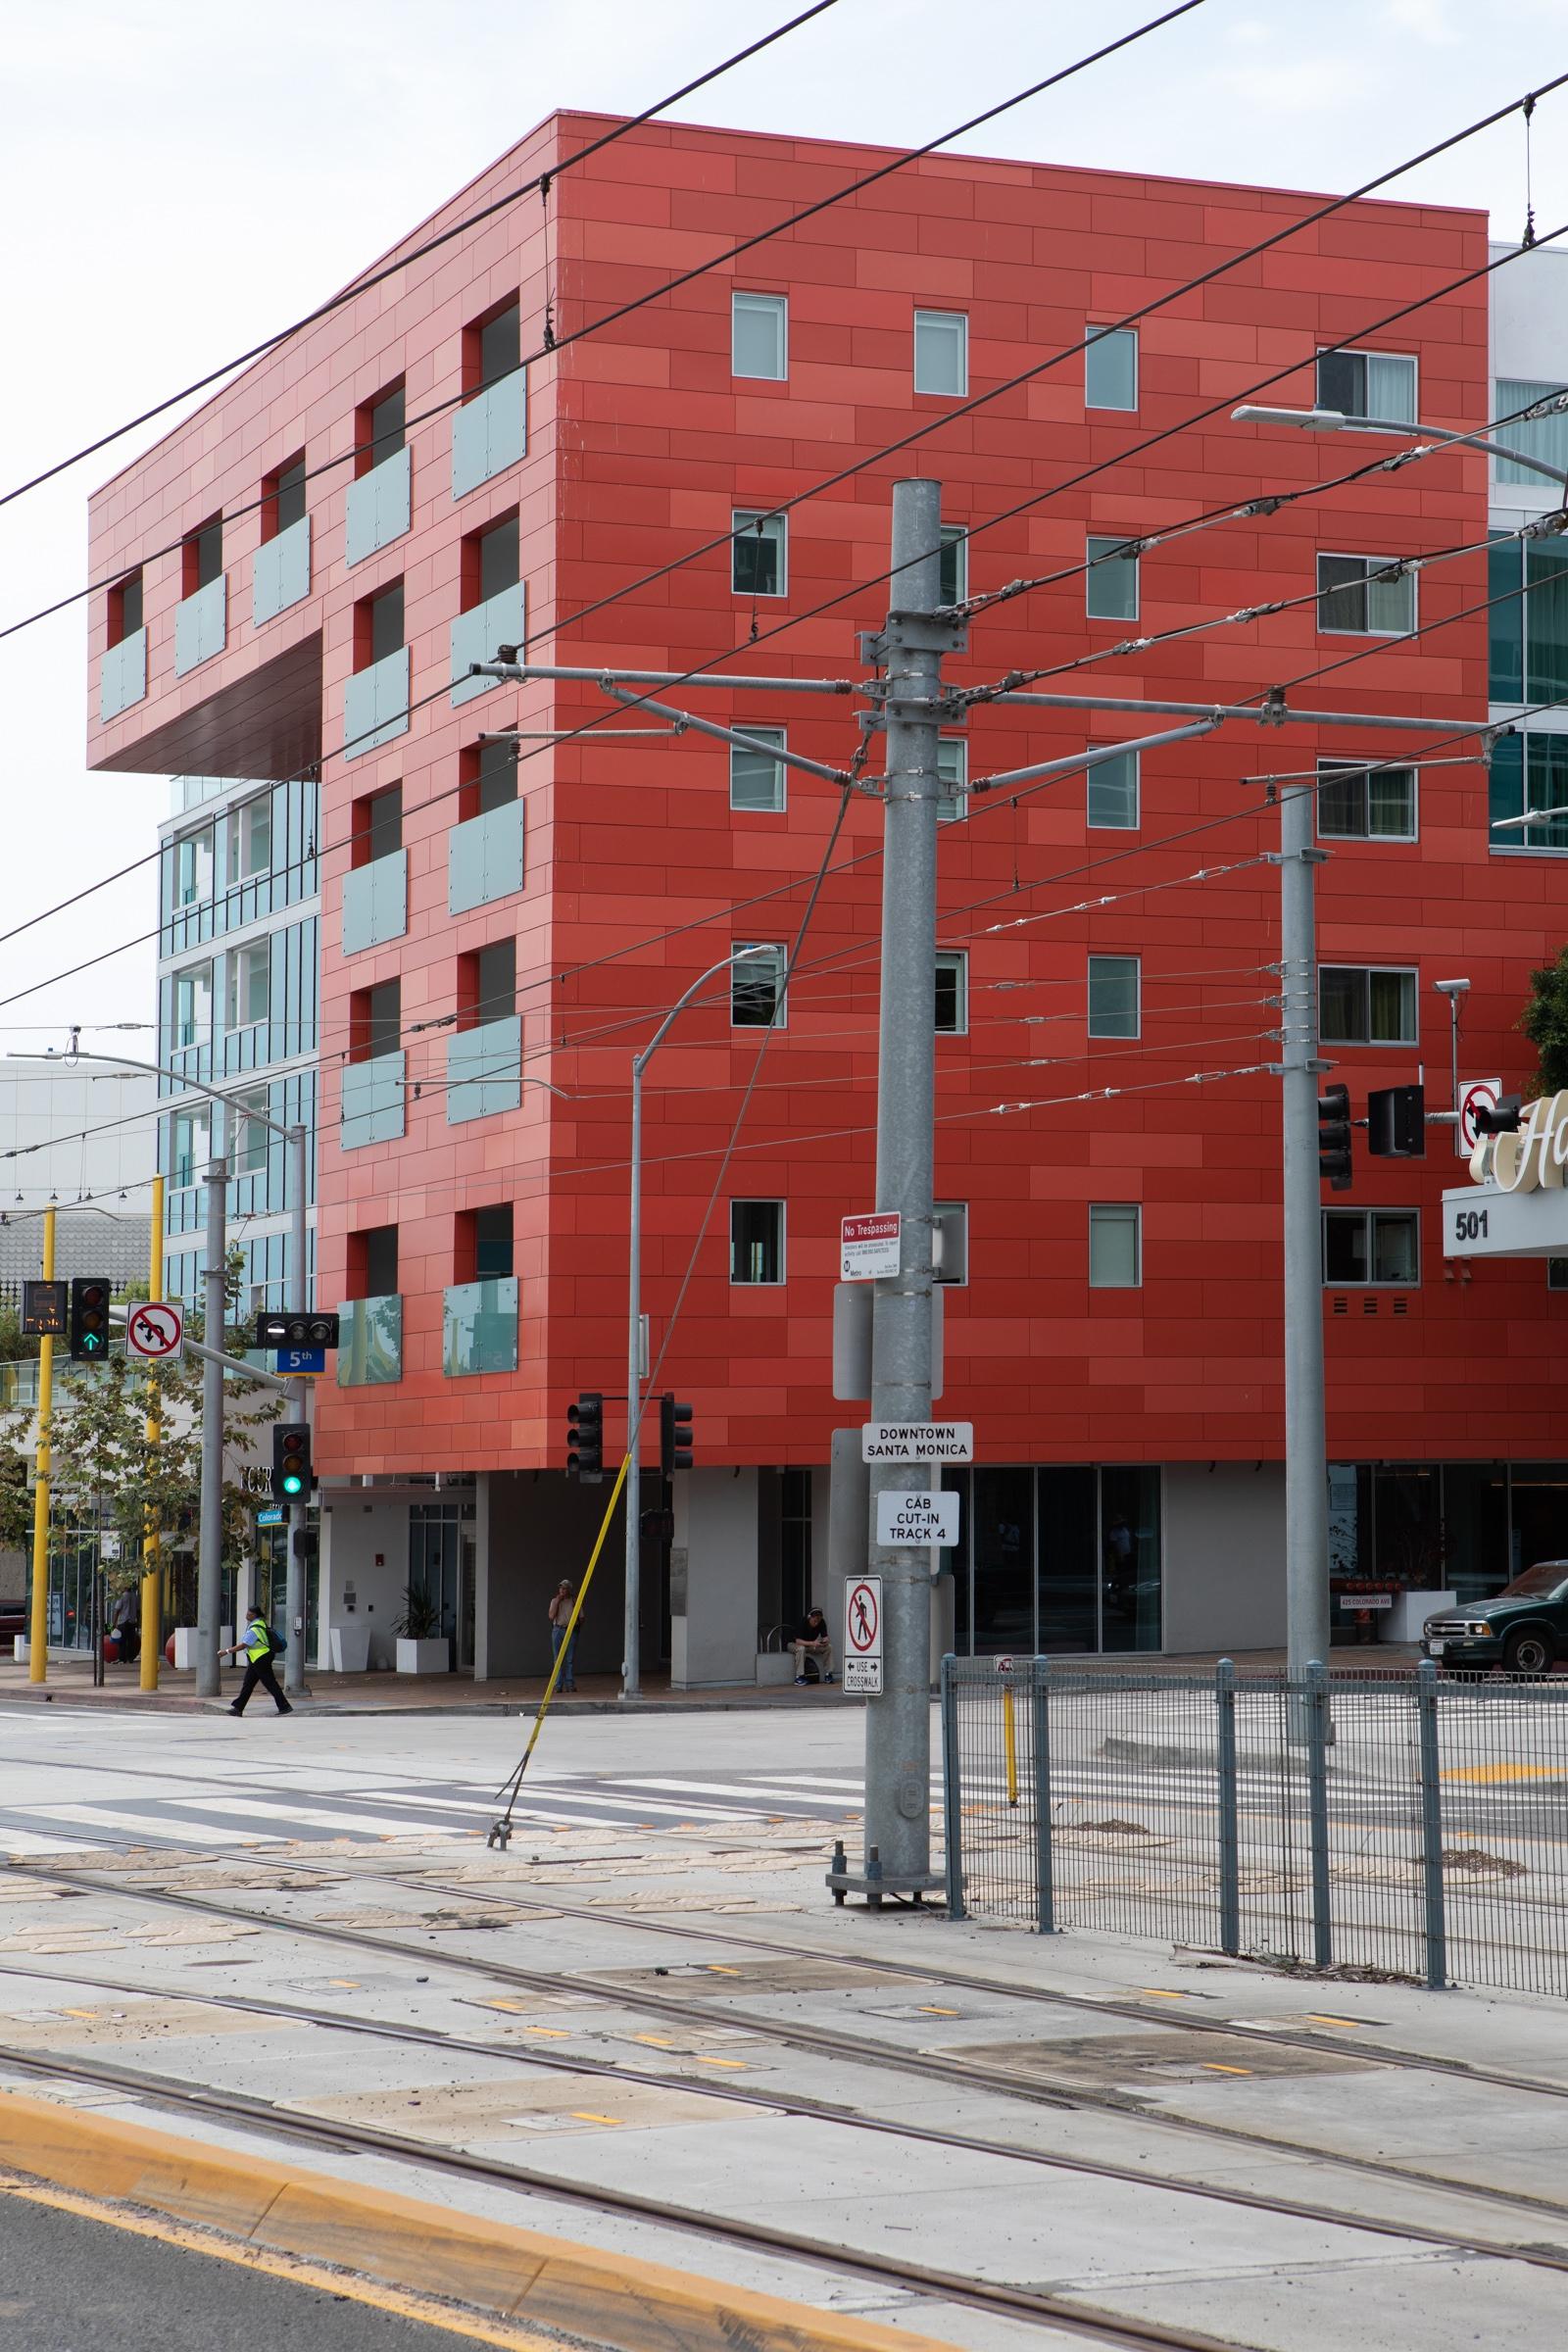 Red Hotel, Colorado Ave, Santa  - odouglas | ello